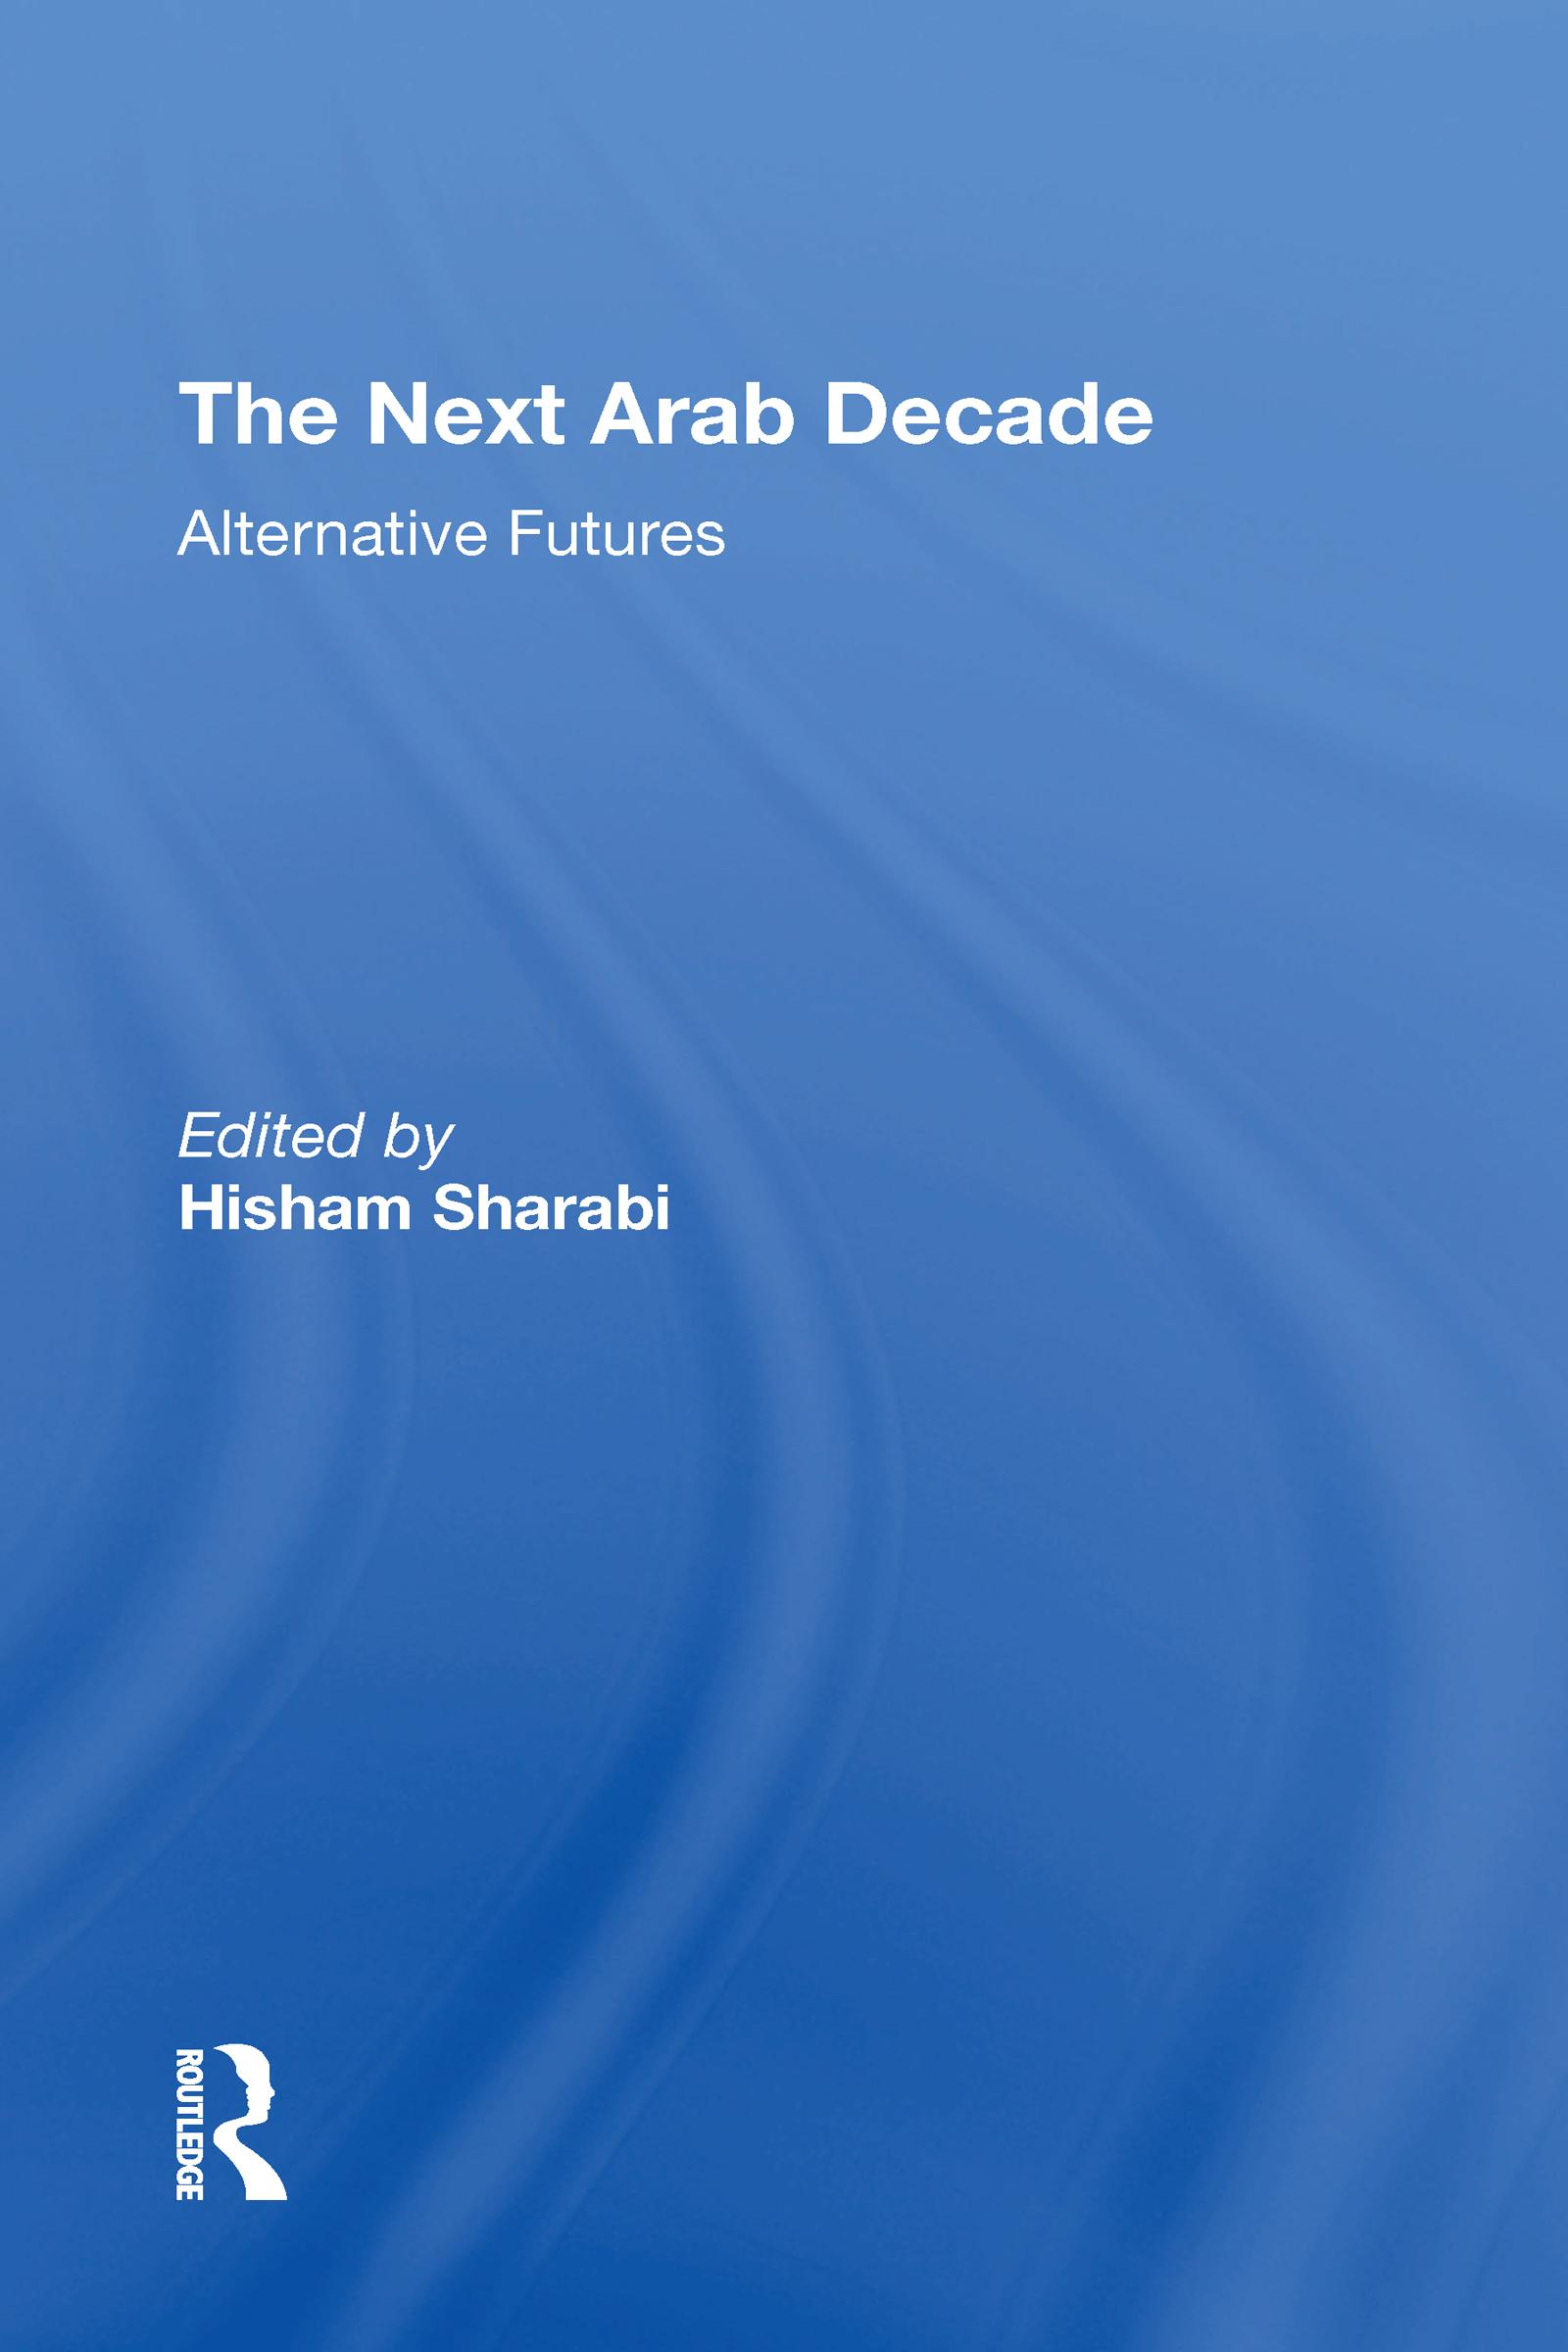 The Next Arab Decade